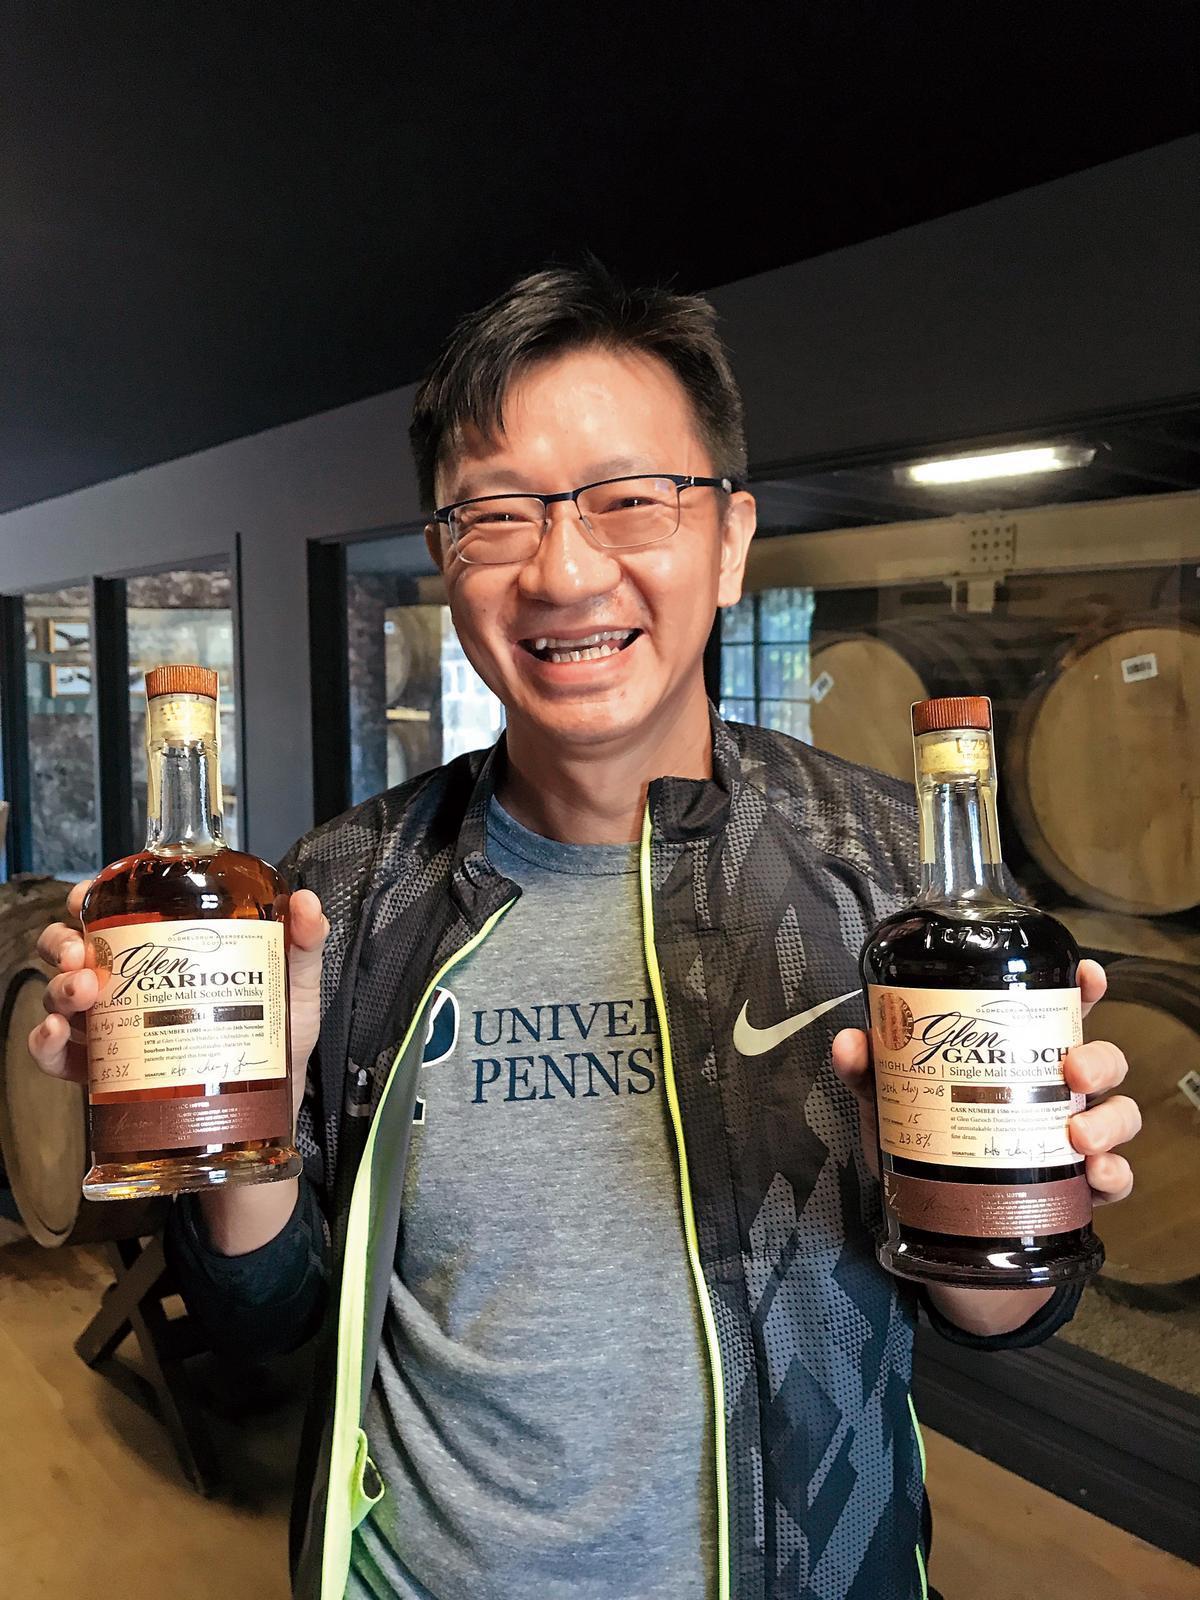 K大(姚和成)現場裝了2瓶,分別是1978年的Peaty波本、酒精度55.3%(左),及1985年的Peaty雪莉Butt、酒精度43.8%,不愧是「台灣之光」。